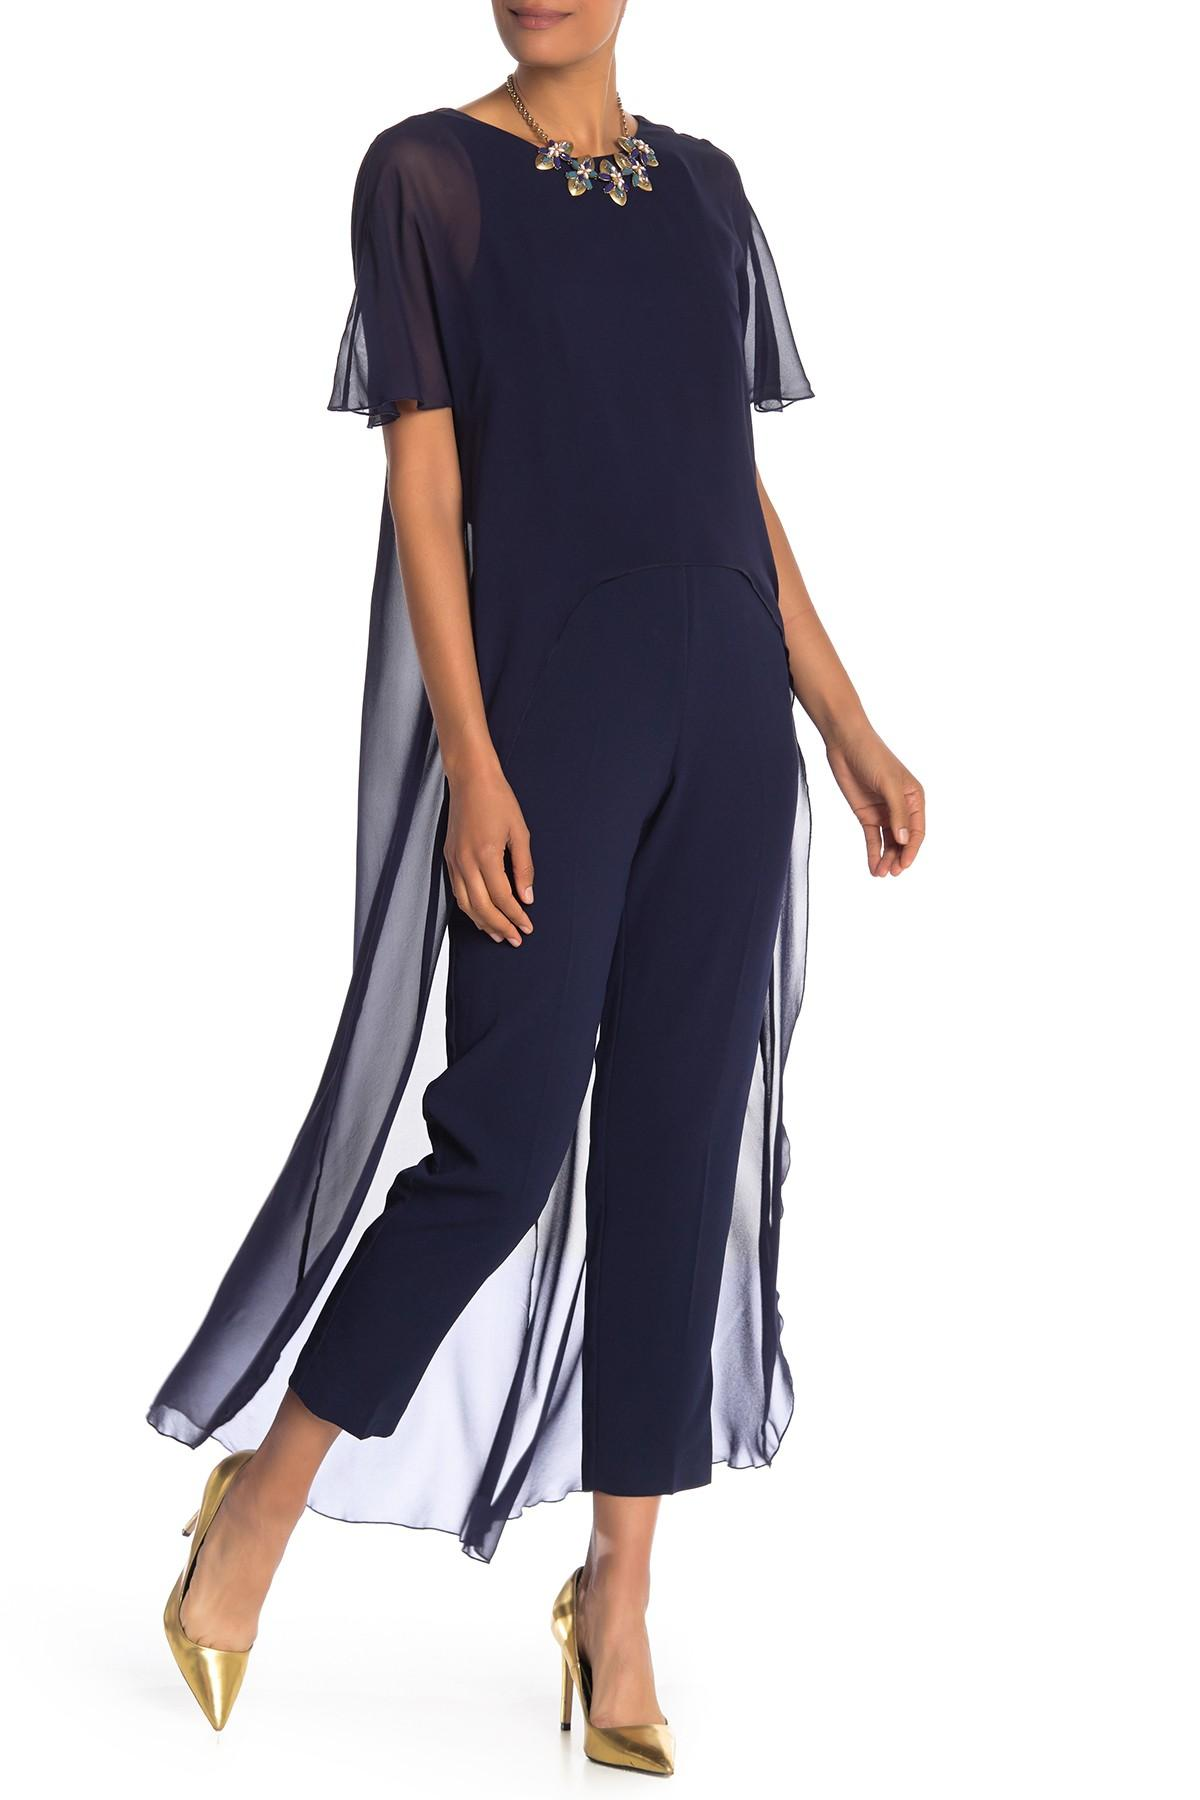 fbf1c60eca63 Lyst - Trina Turk Capote Silk Overlay Jumpsuit in Blue